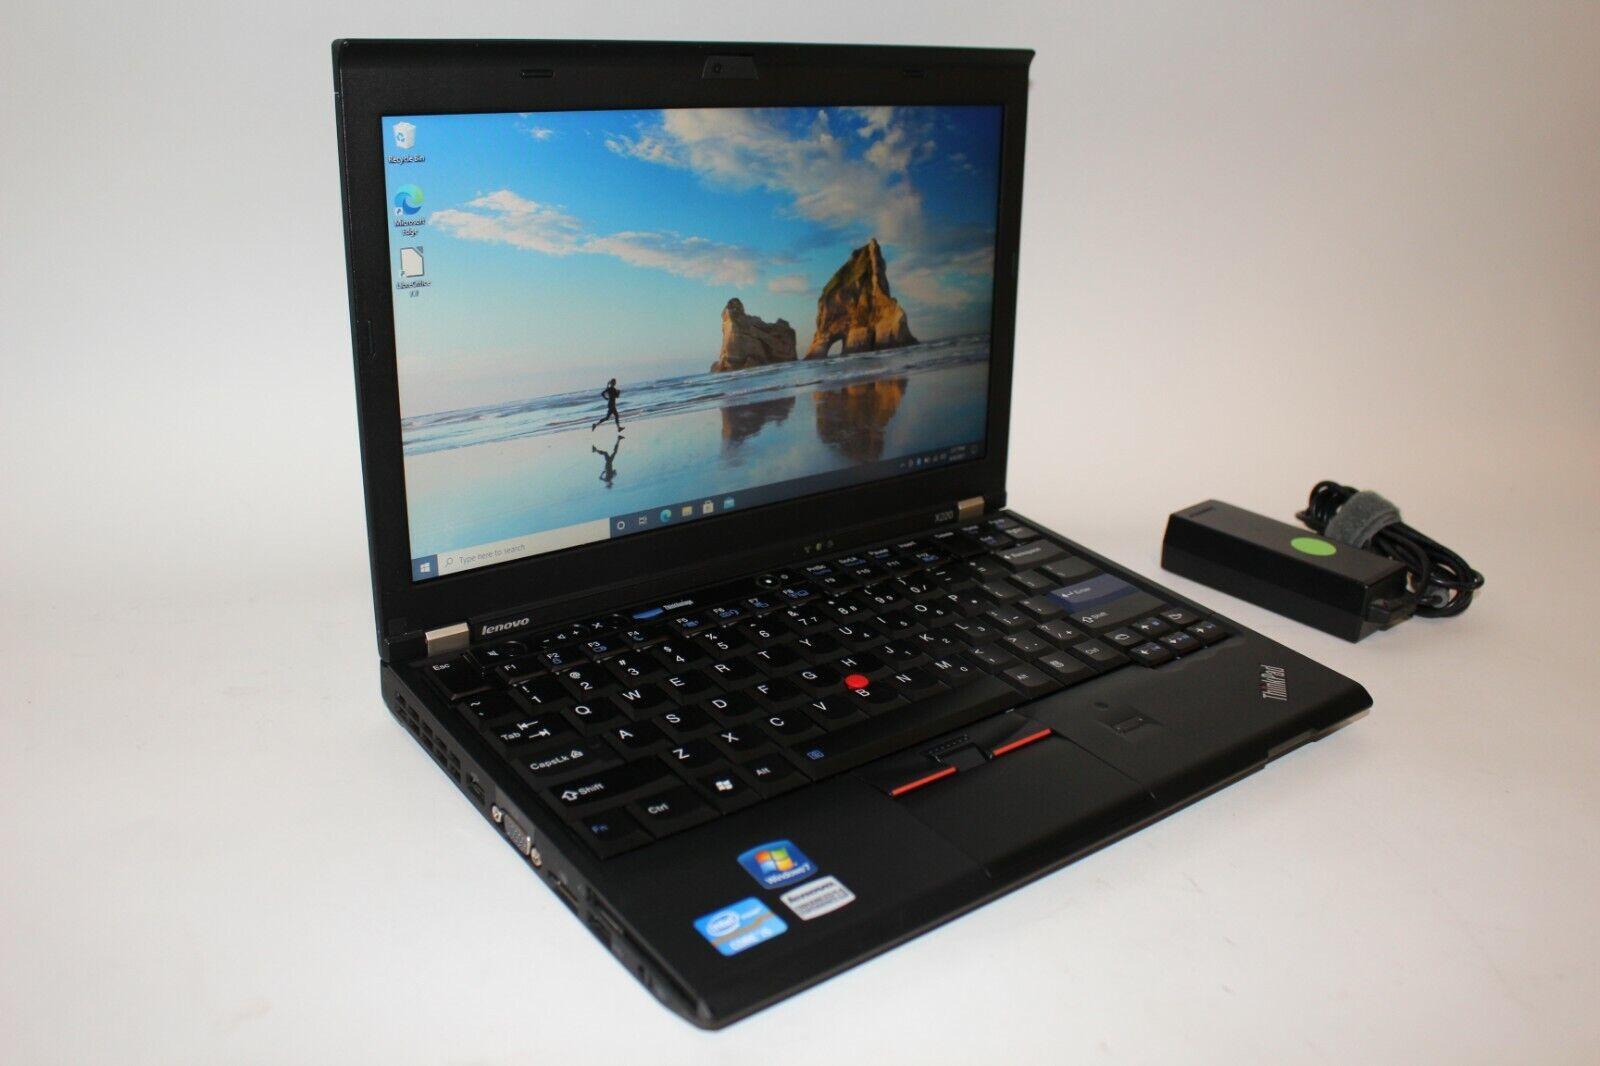 "Laptop Windows - Lenovo Thinkpad X220 Core i5 12.5"" Windows 10 Pro Laptop 120GB SSD 4GB Bluetooth"